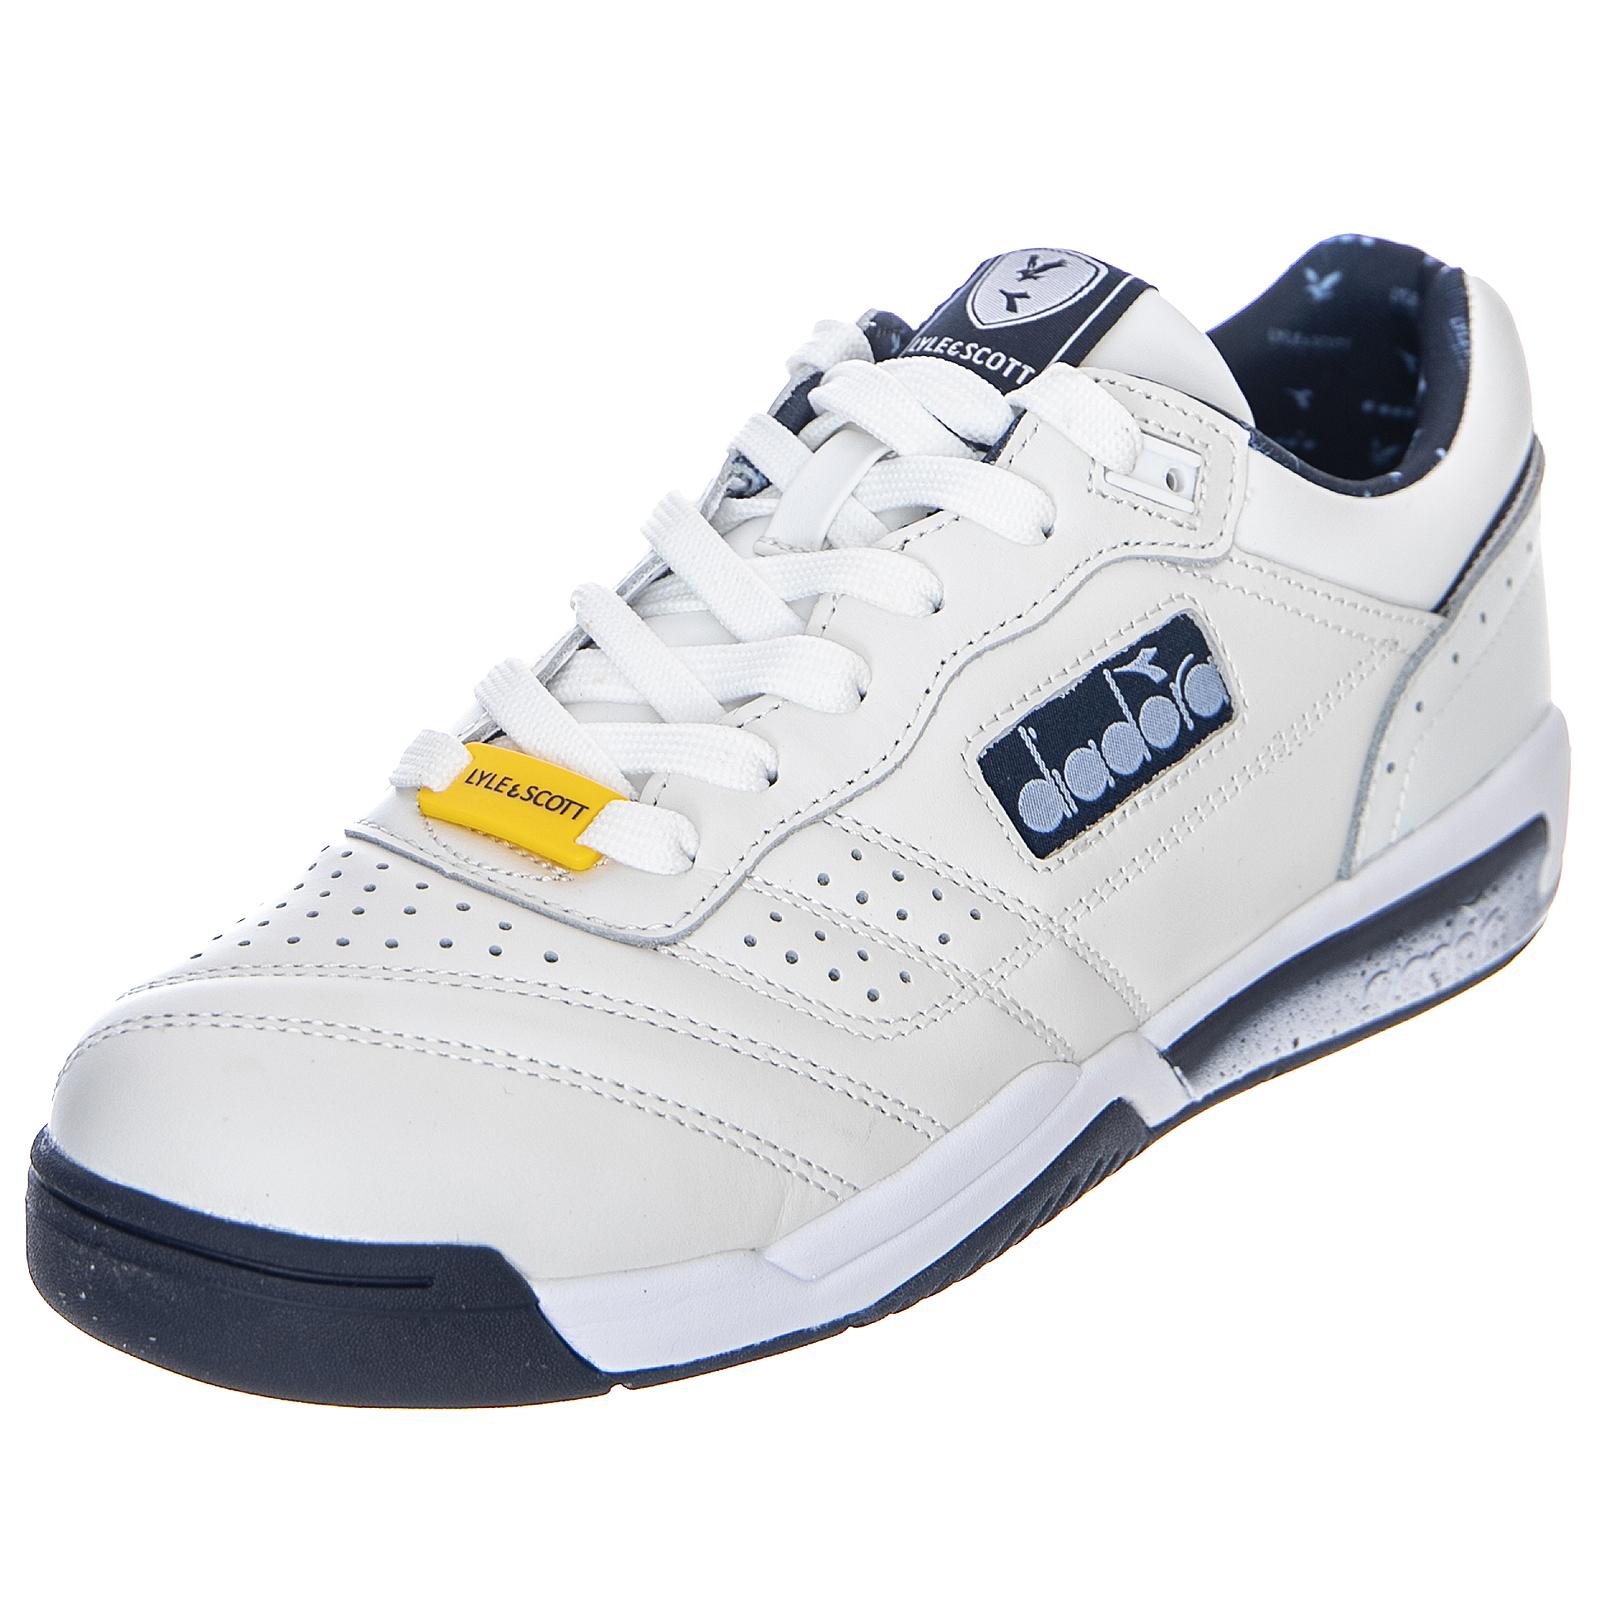 DIADORA action lyle & scott white scarpe basse uomo bianche